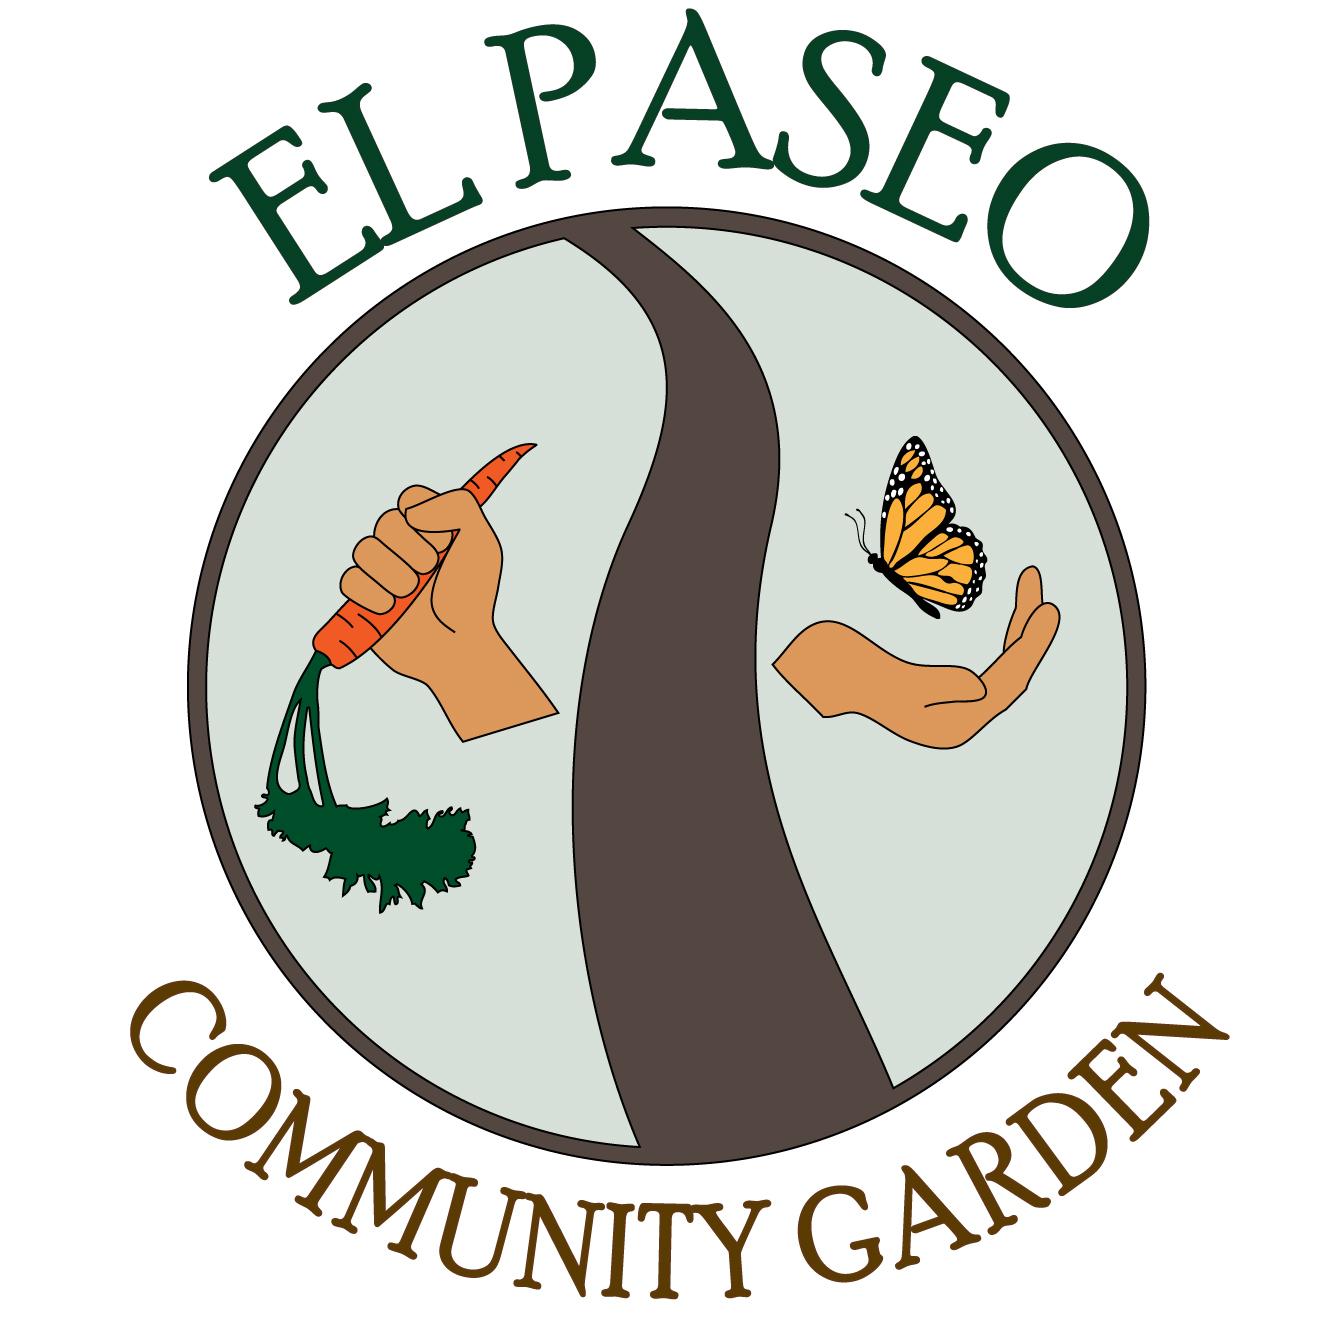 Gate clipart community garden Paseo Community El Community Paseo